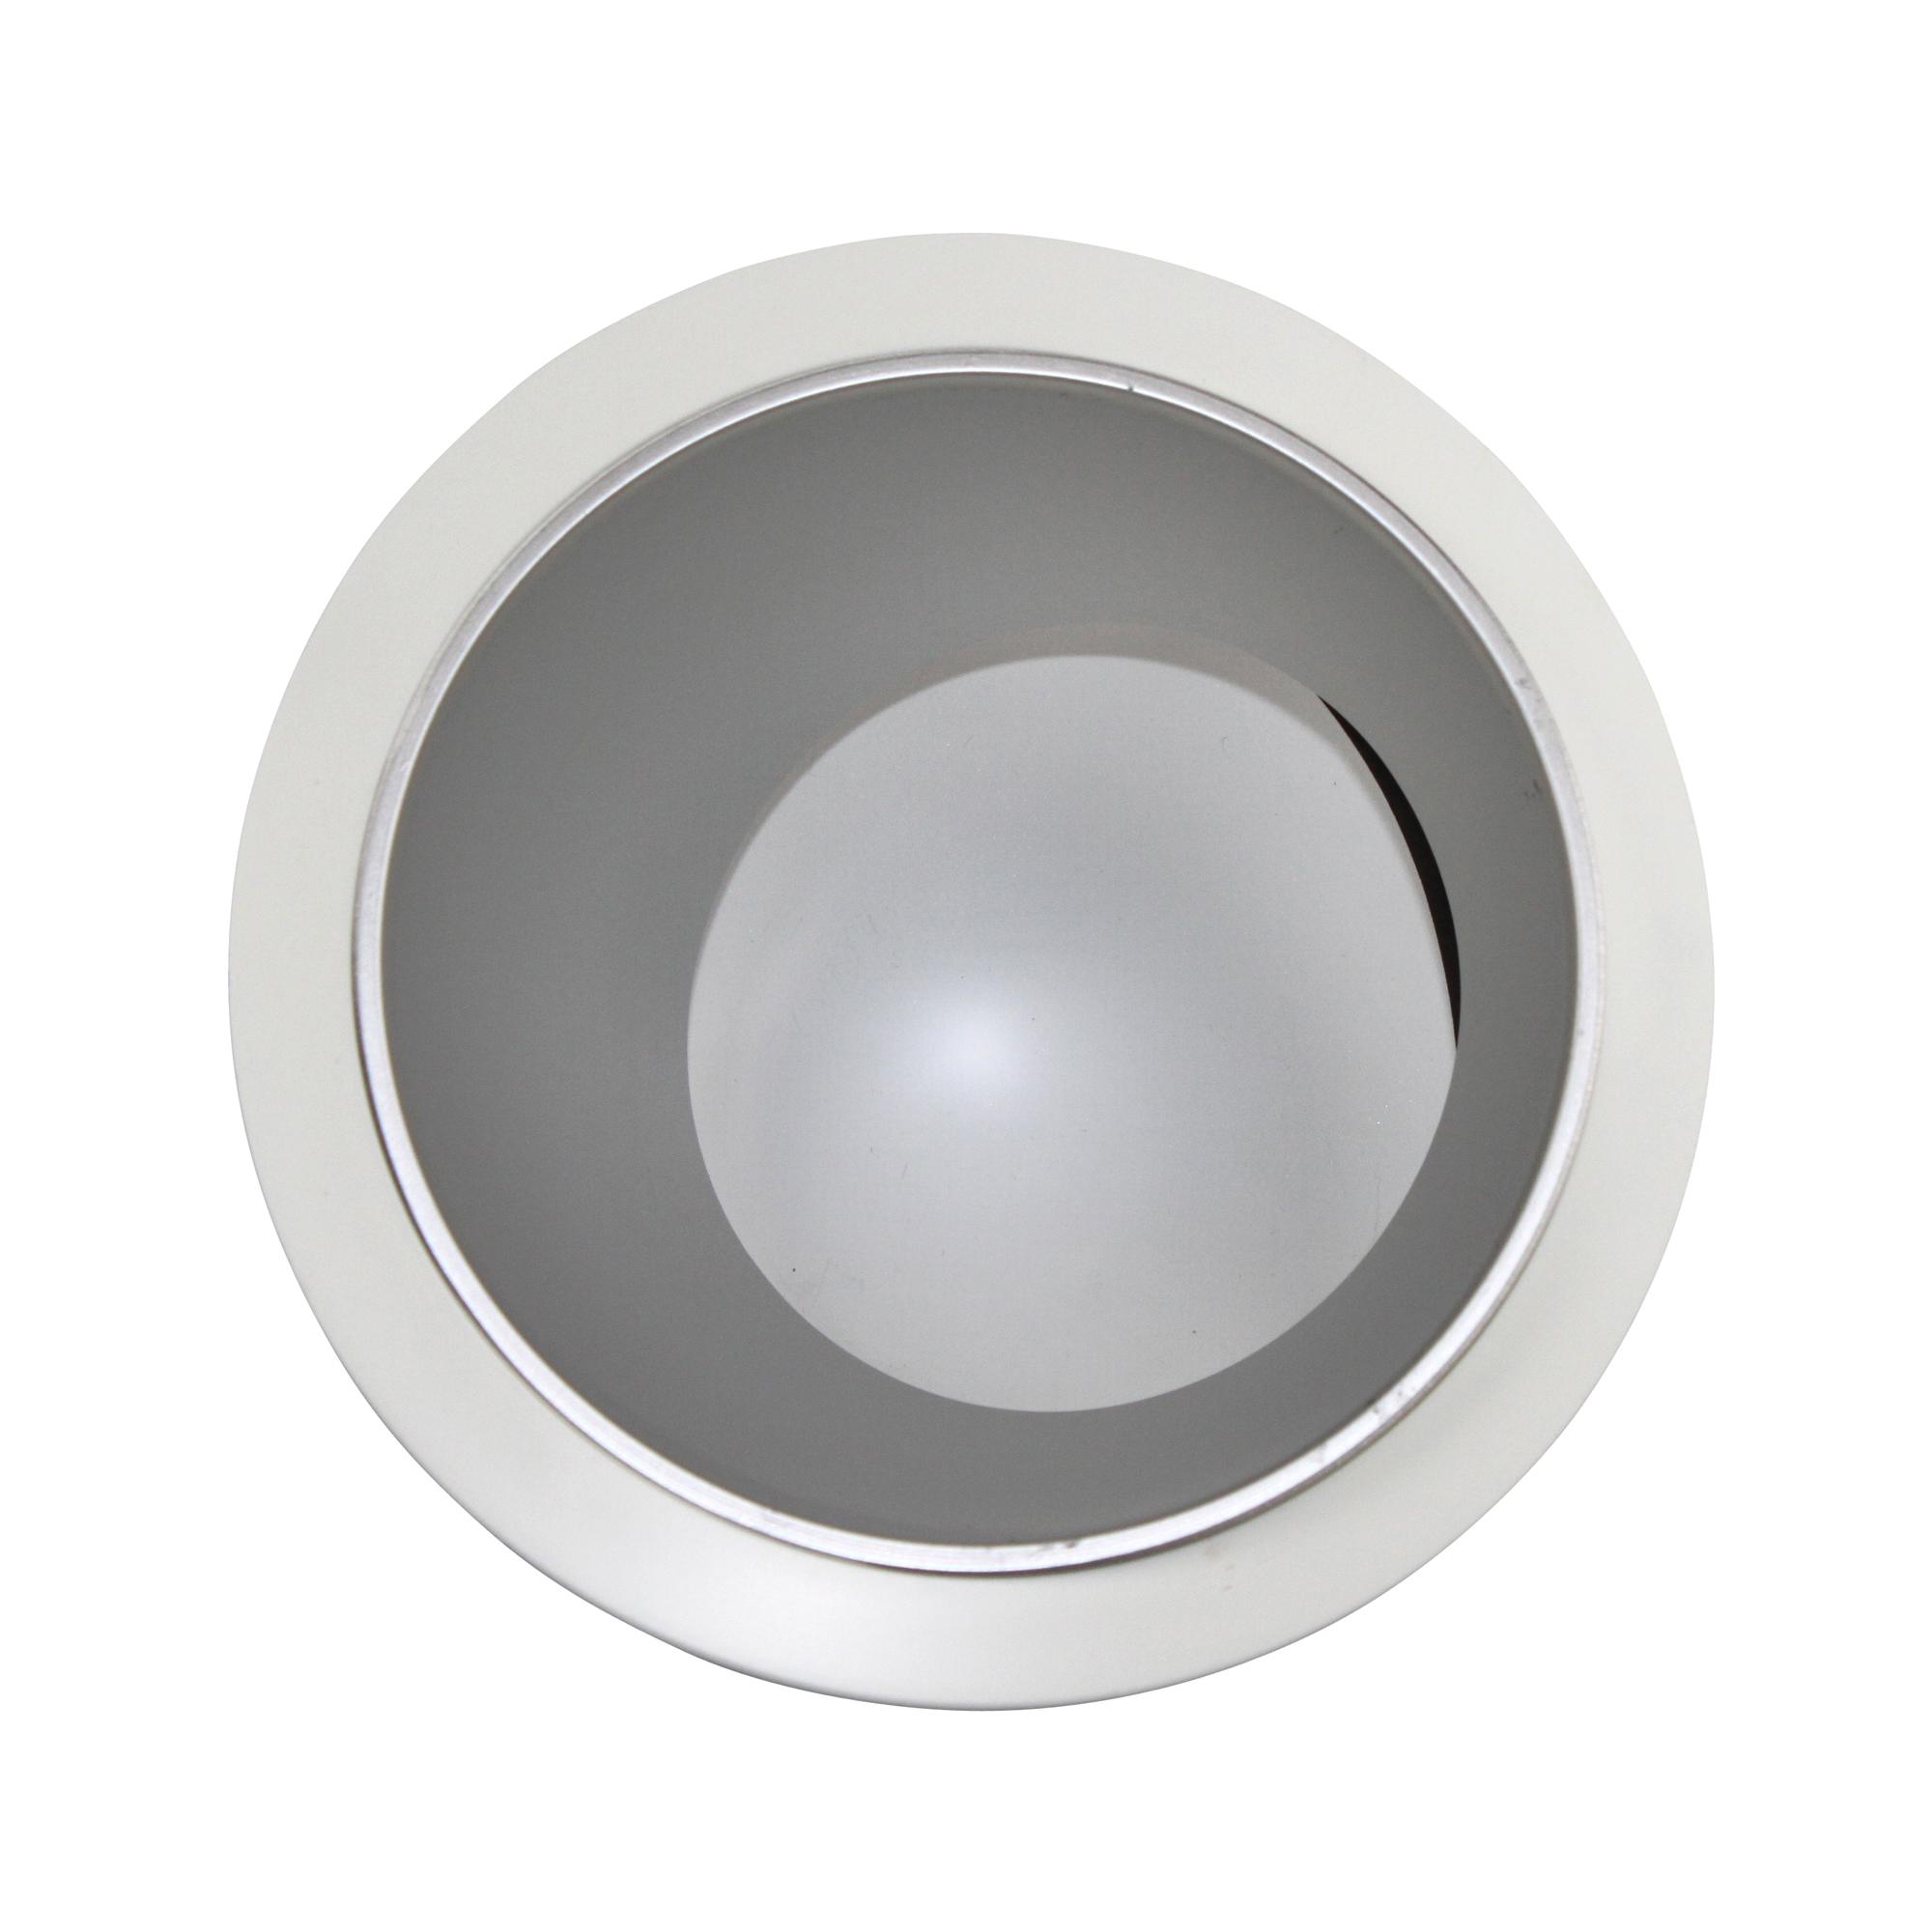 Cooper portfolio 6470h 6 reflector haze halo recessed for Number of recessed lights per room